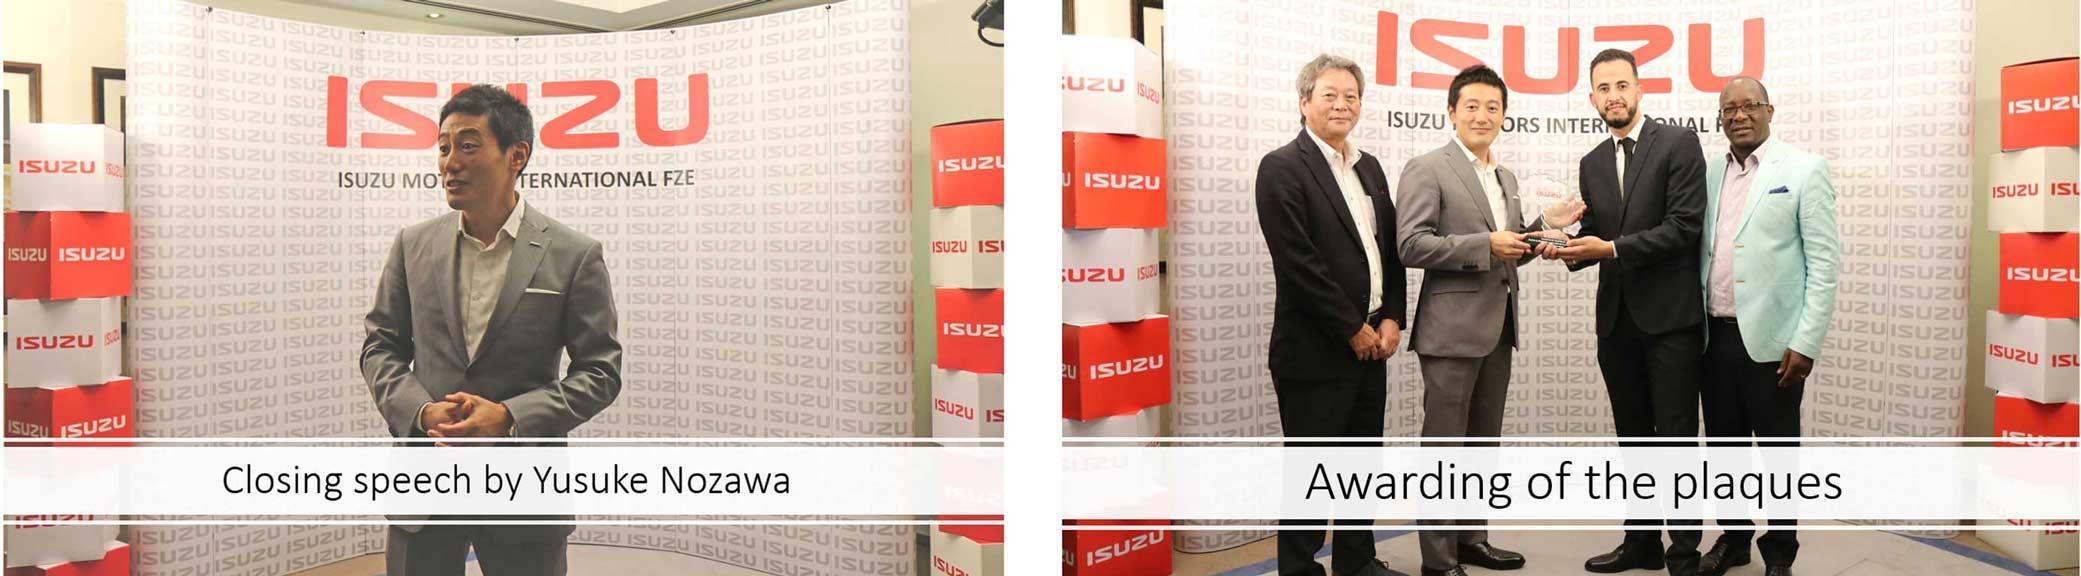 Isuzu Sales Challenge Africa Closing Speech and Plaques Awarding